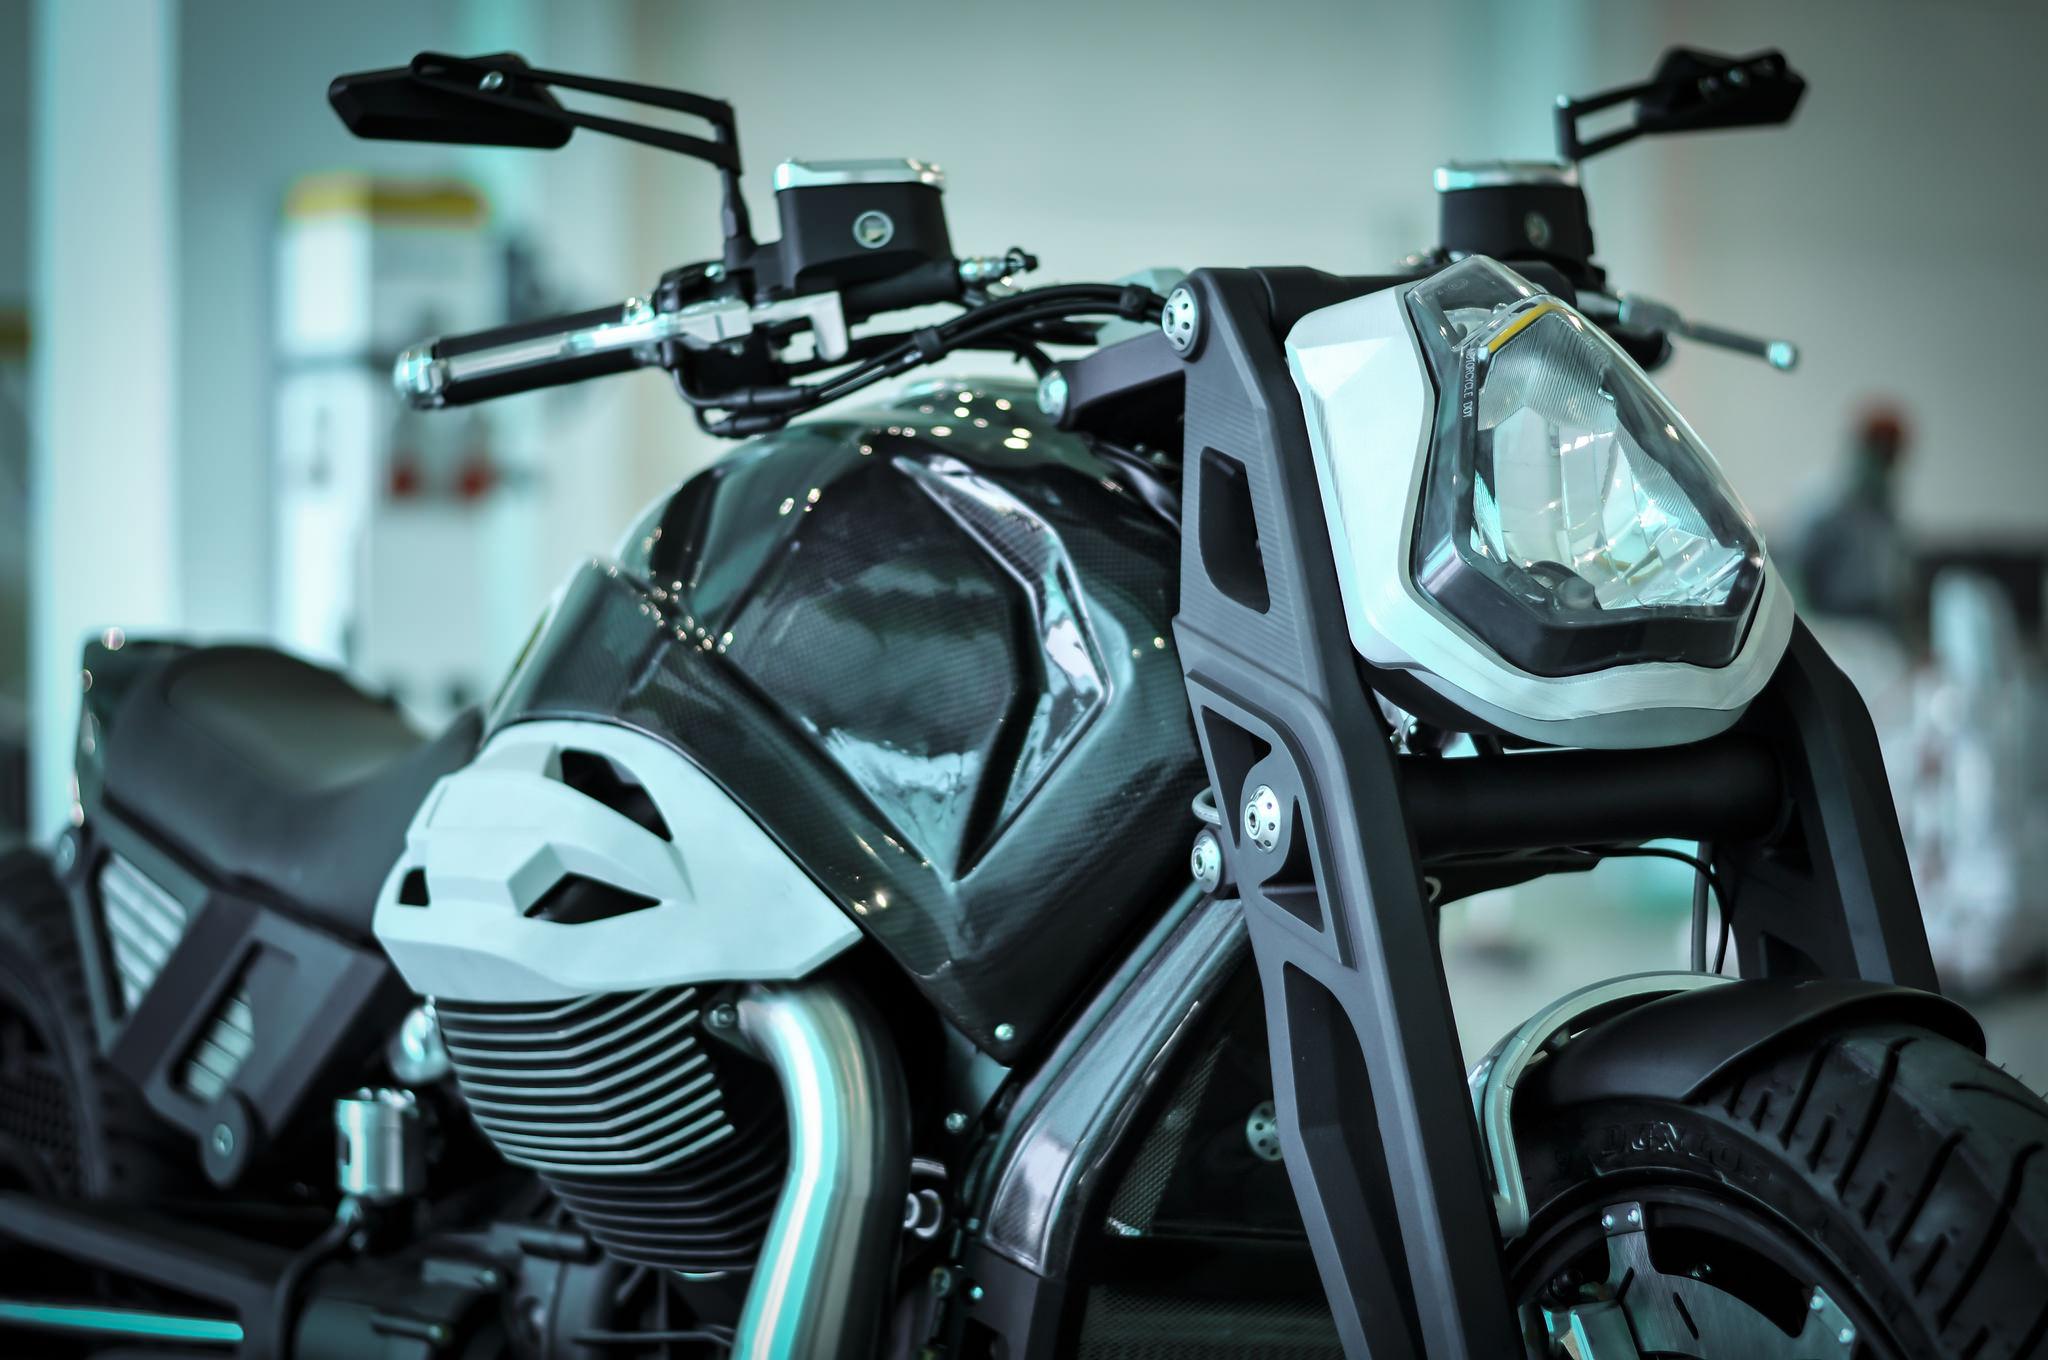 Lupus Alpha - bike details